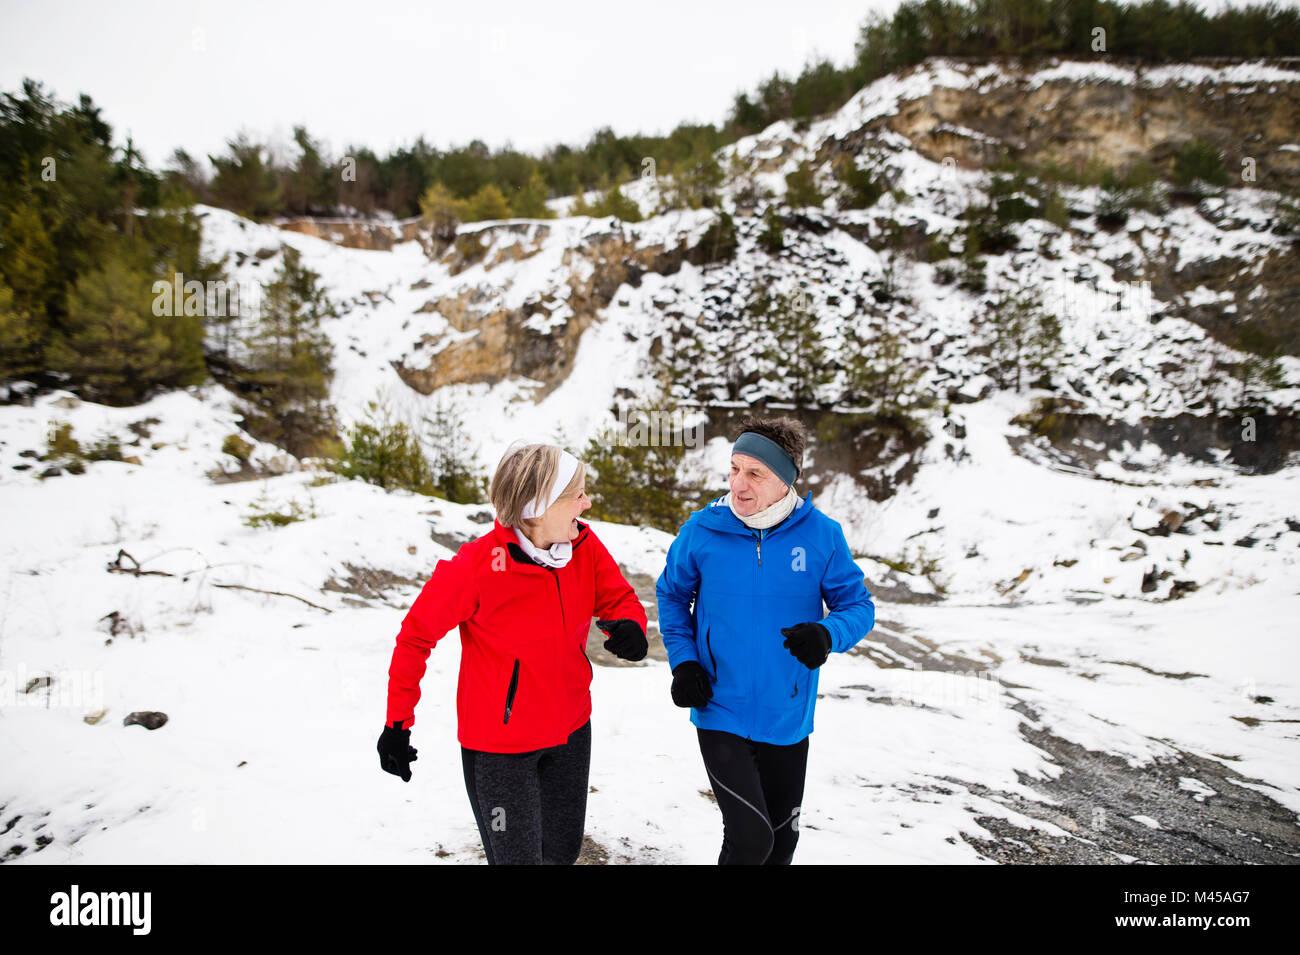 Senior paar Joggen im Winter Natur. Stockfoto